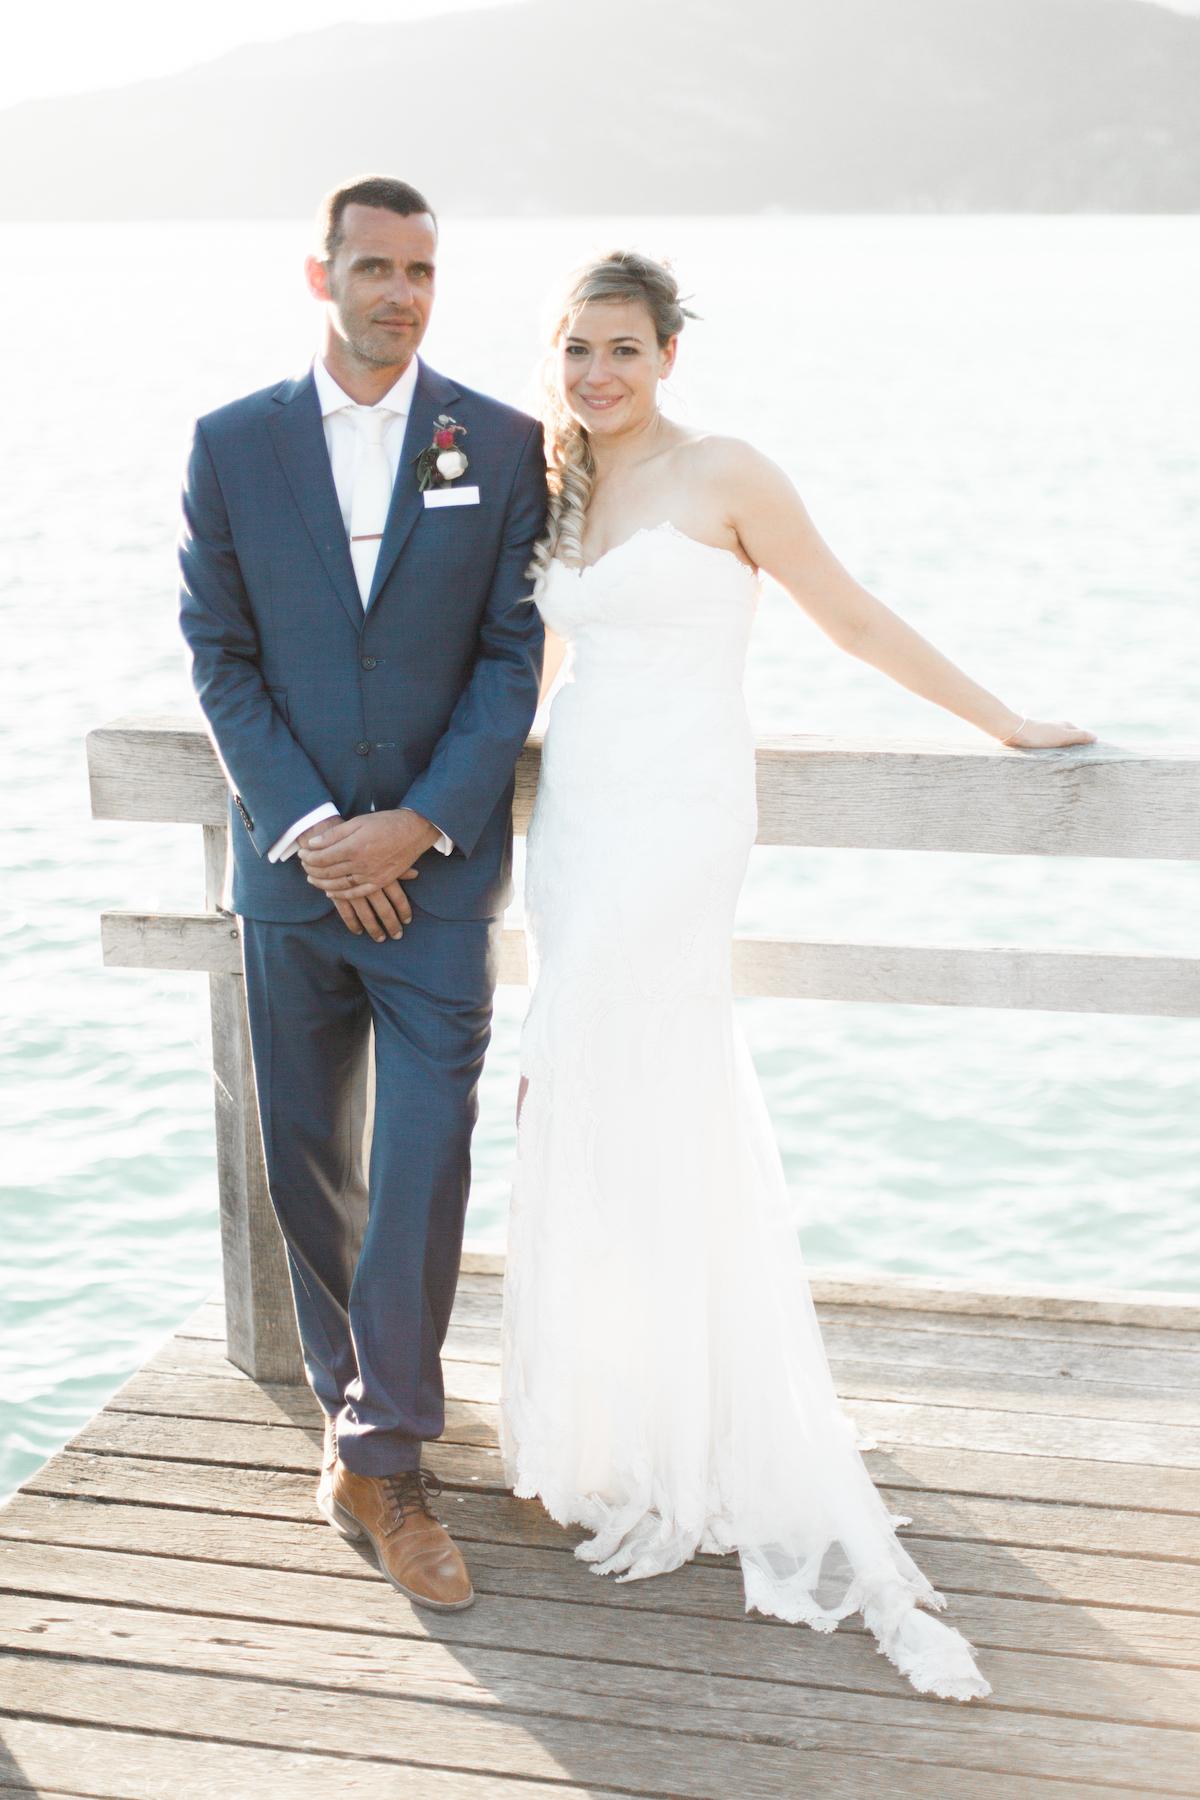 annecy-wedding-photos-216.jpg